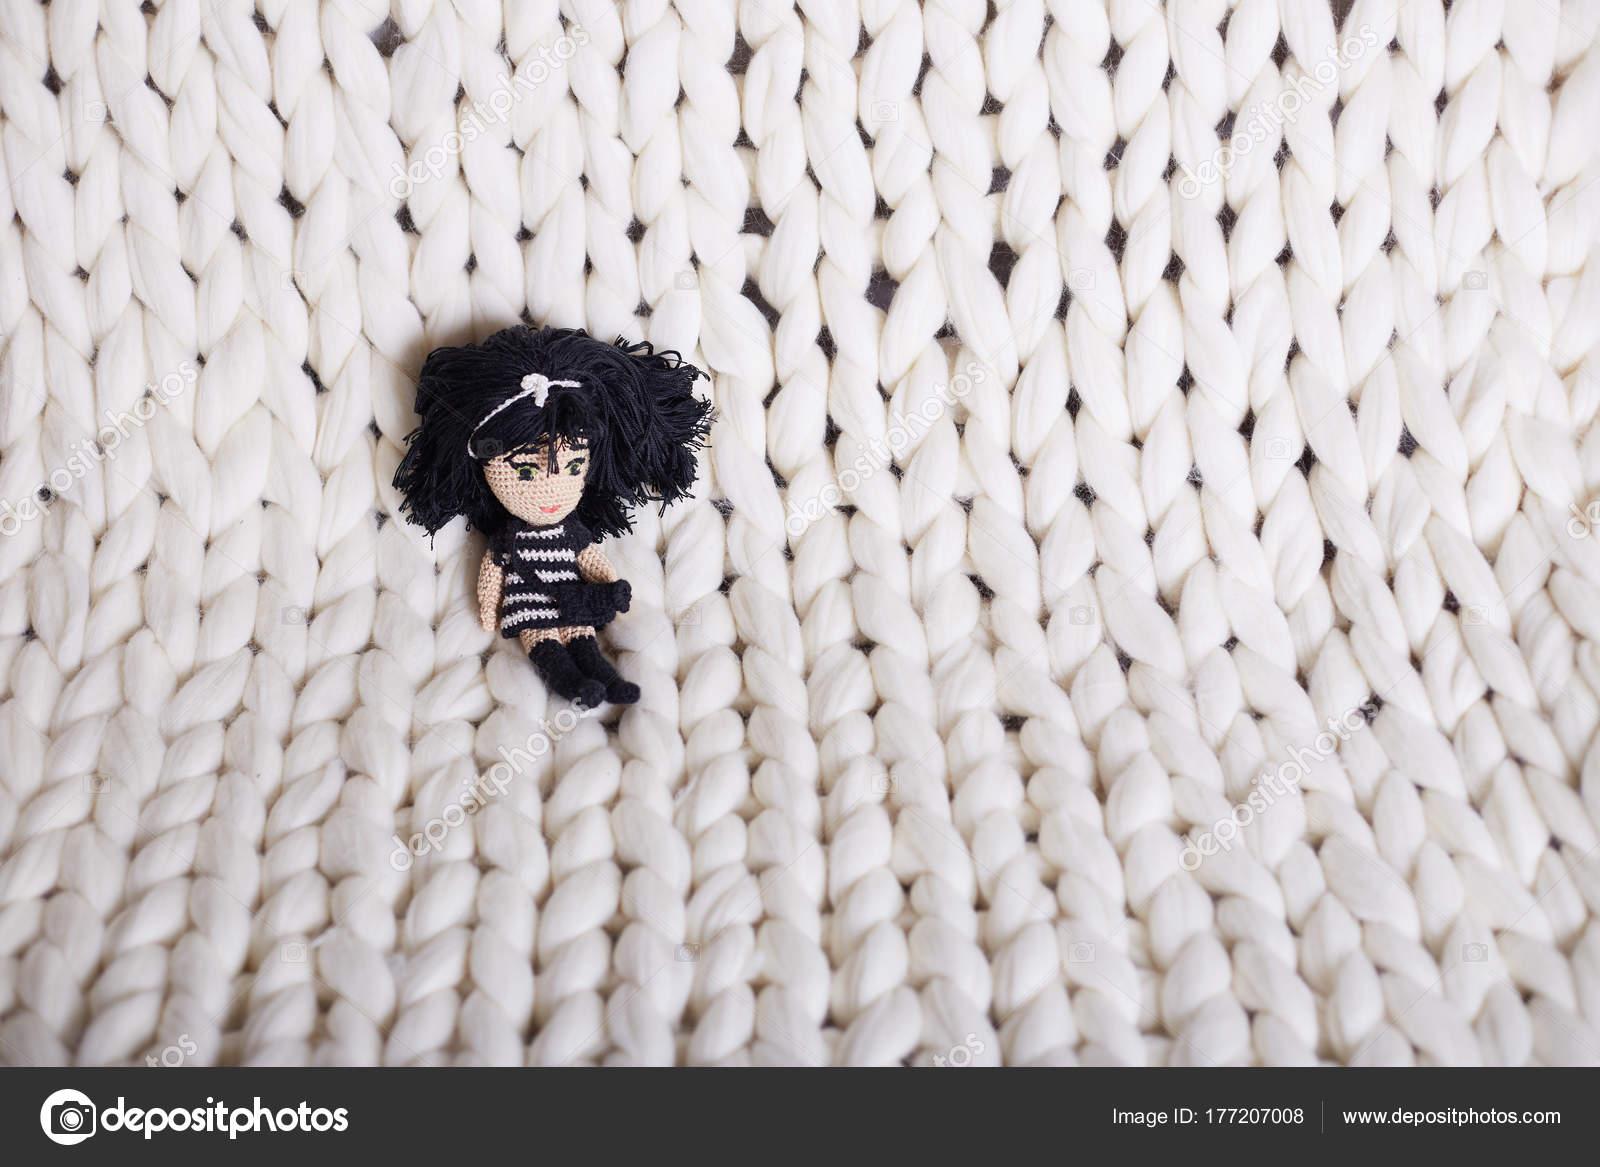 01e490c20afe Η υφή του close-up χοντρά πουλόβερ μπεζ ύφασμα. Πλεκτό υφή φόντου. μεγάλο  λευκό καρό πλεκτό. υφή Κουβέρτα πλεκτή Κοτσίδα — Εικόνα από ...